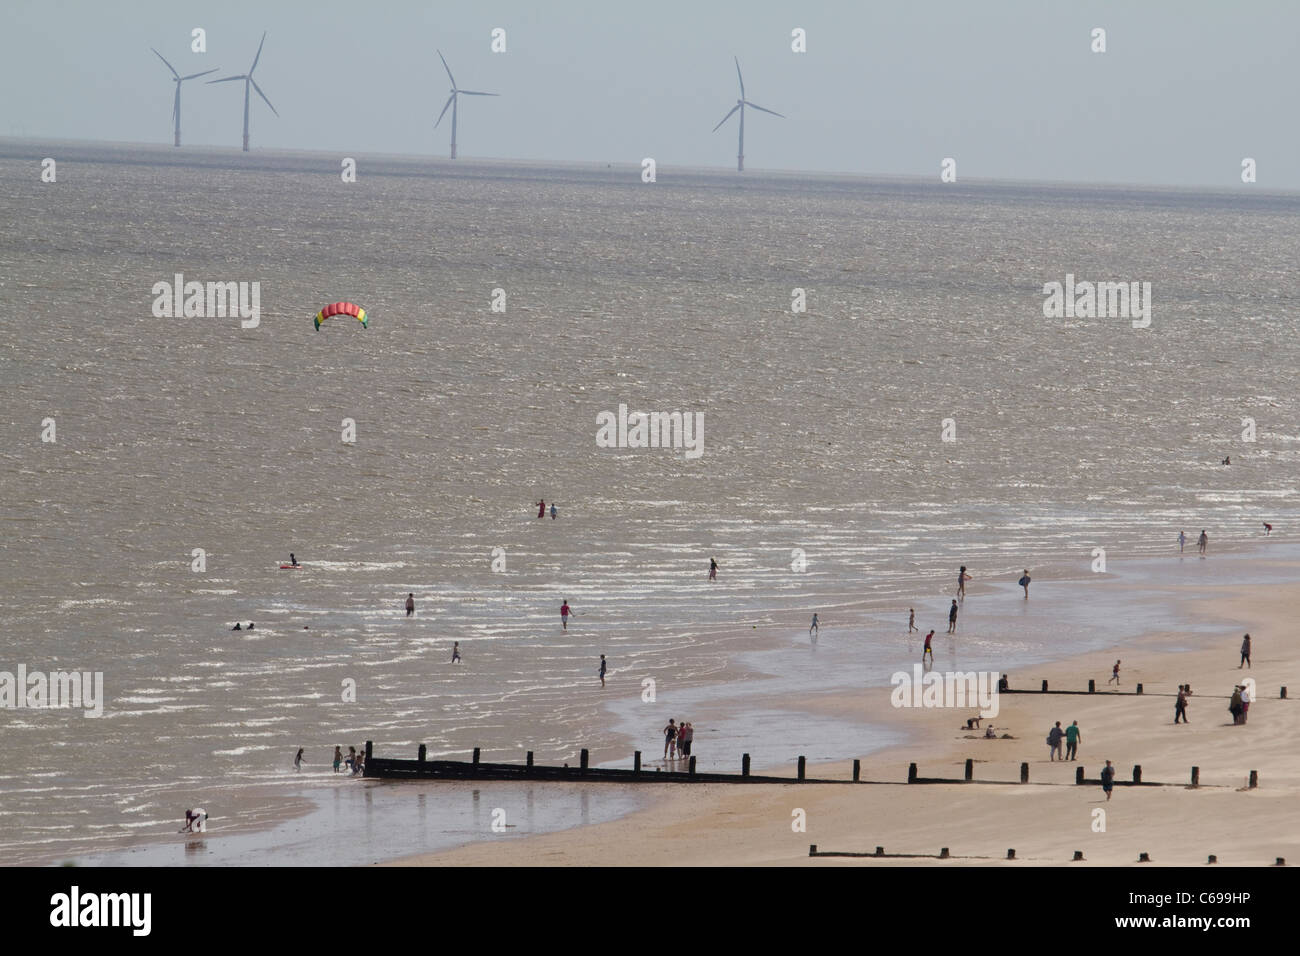 Frinton essex Gunfleet Sands national grid wind turbines in north sea - Stock Image